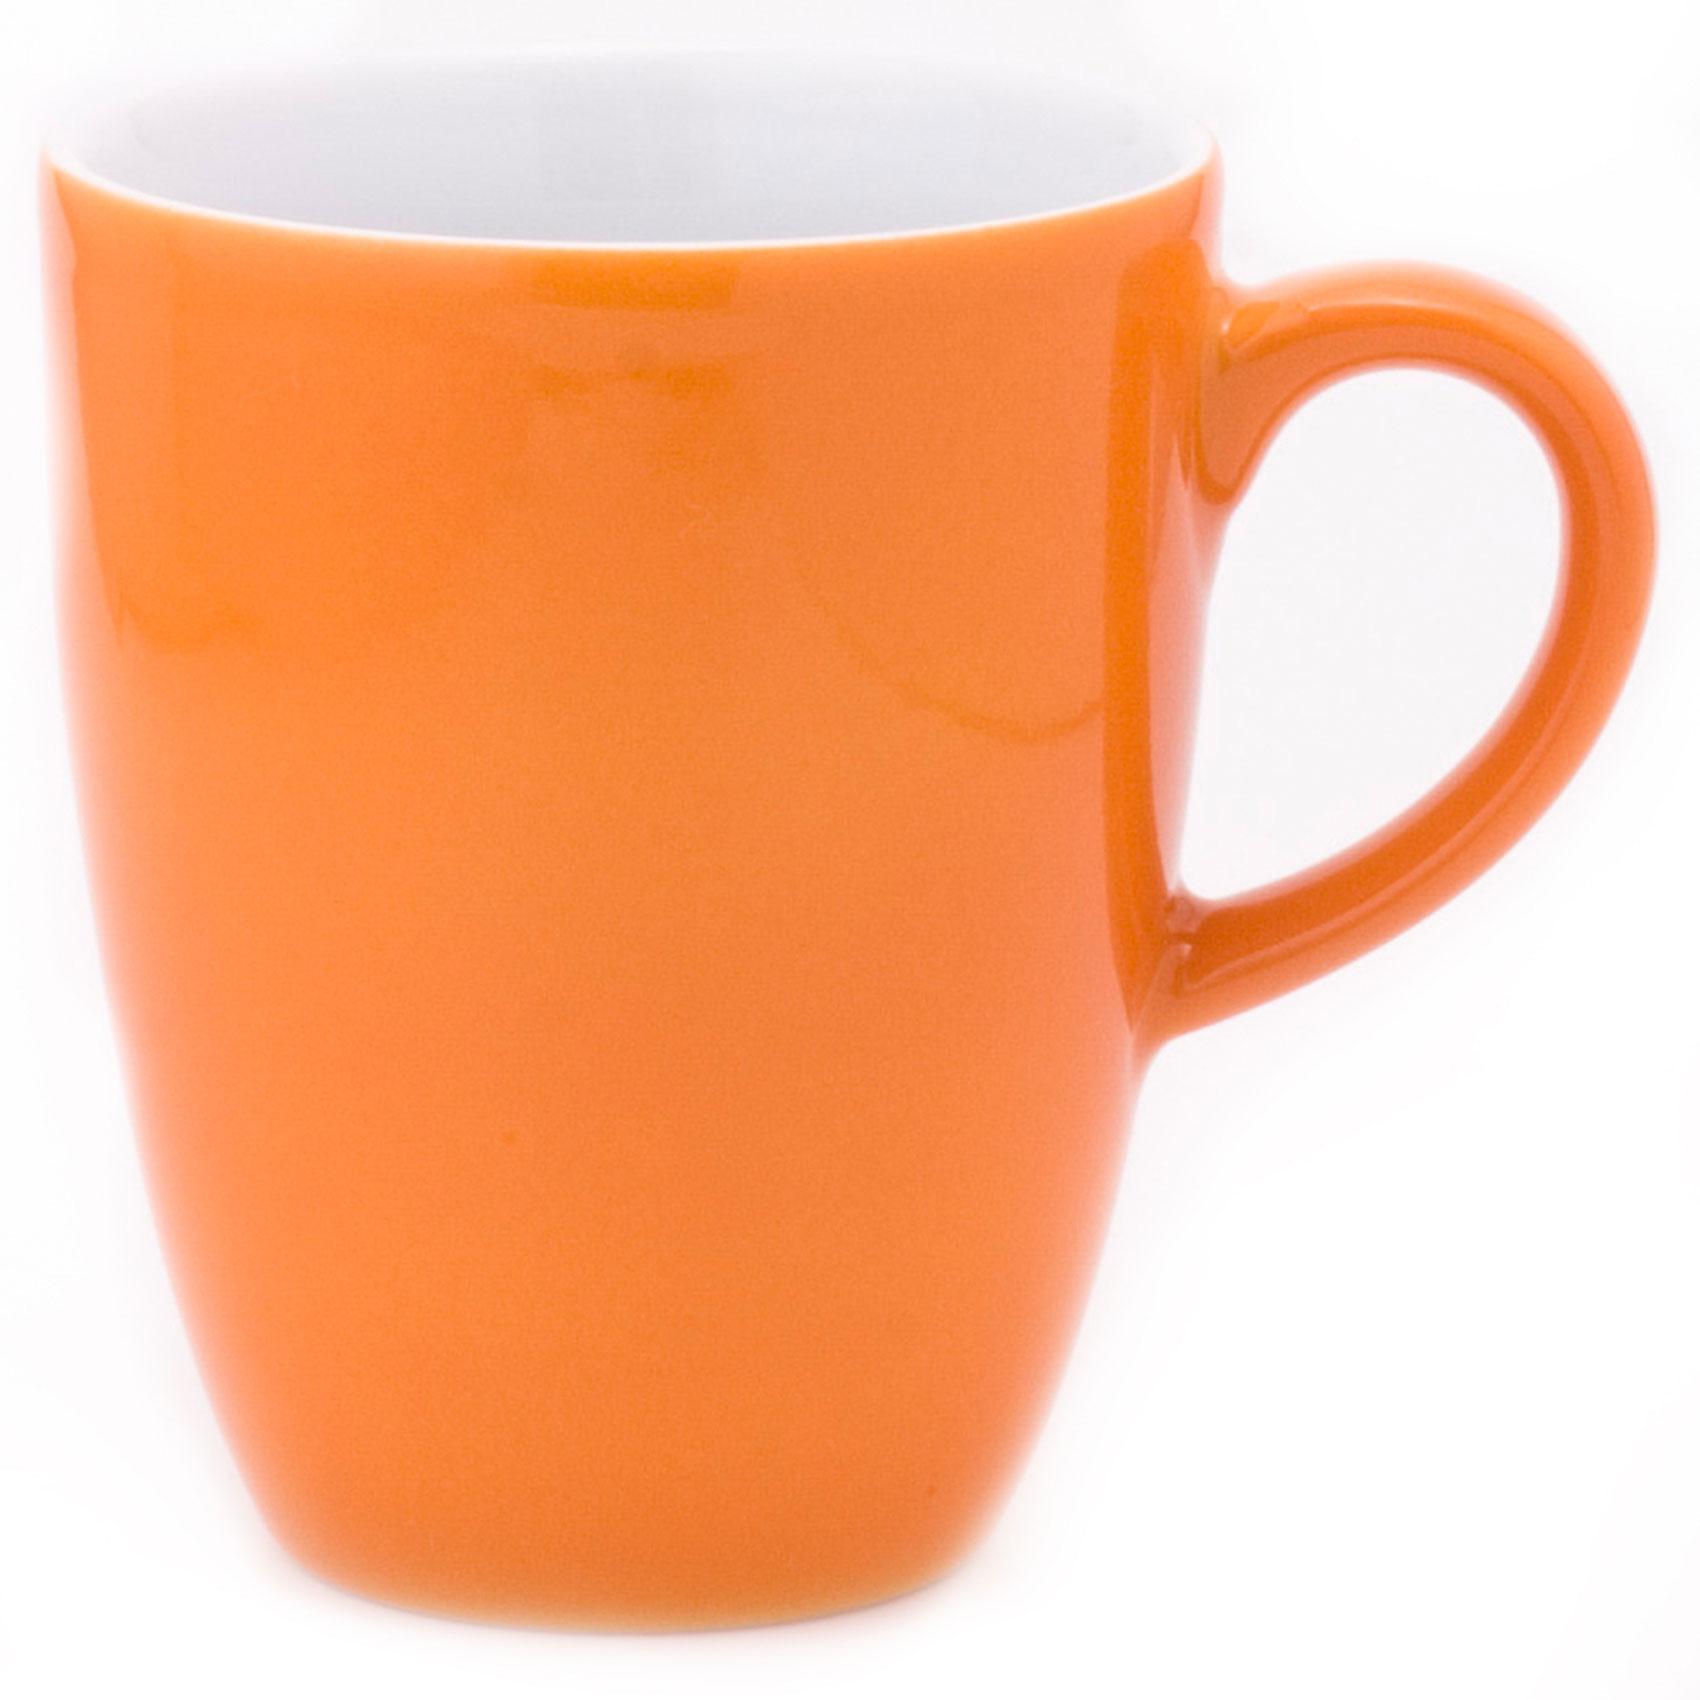 Kahla Pronto Colore Macchiatobecher Kaffee Tasse Becher Porzellan Orange 280 ml